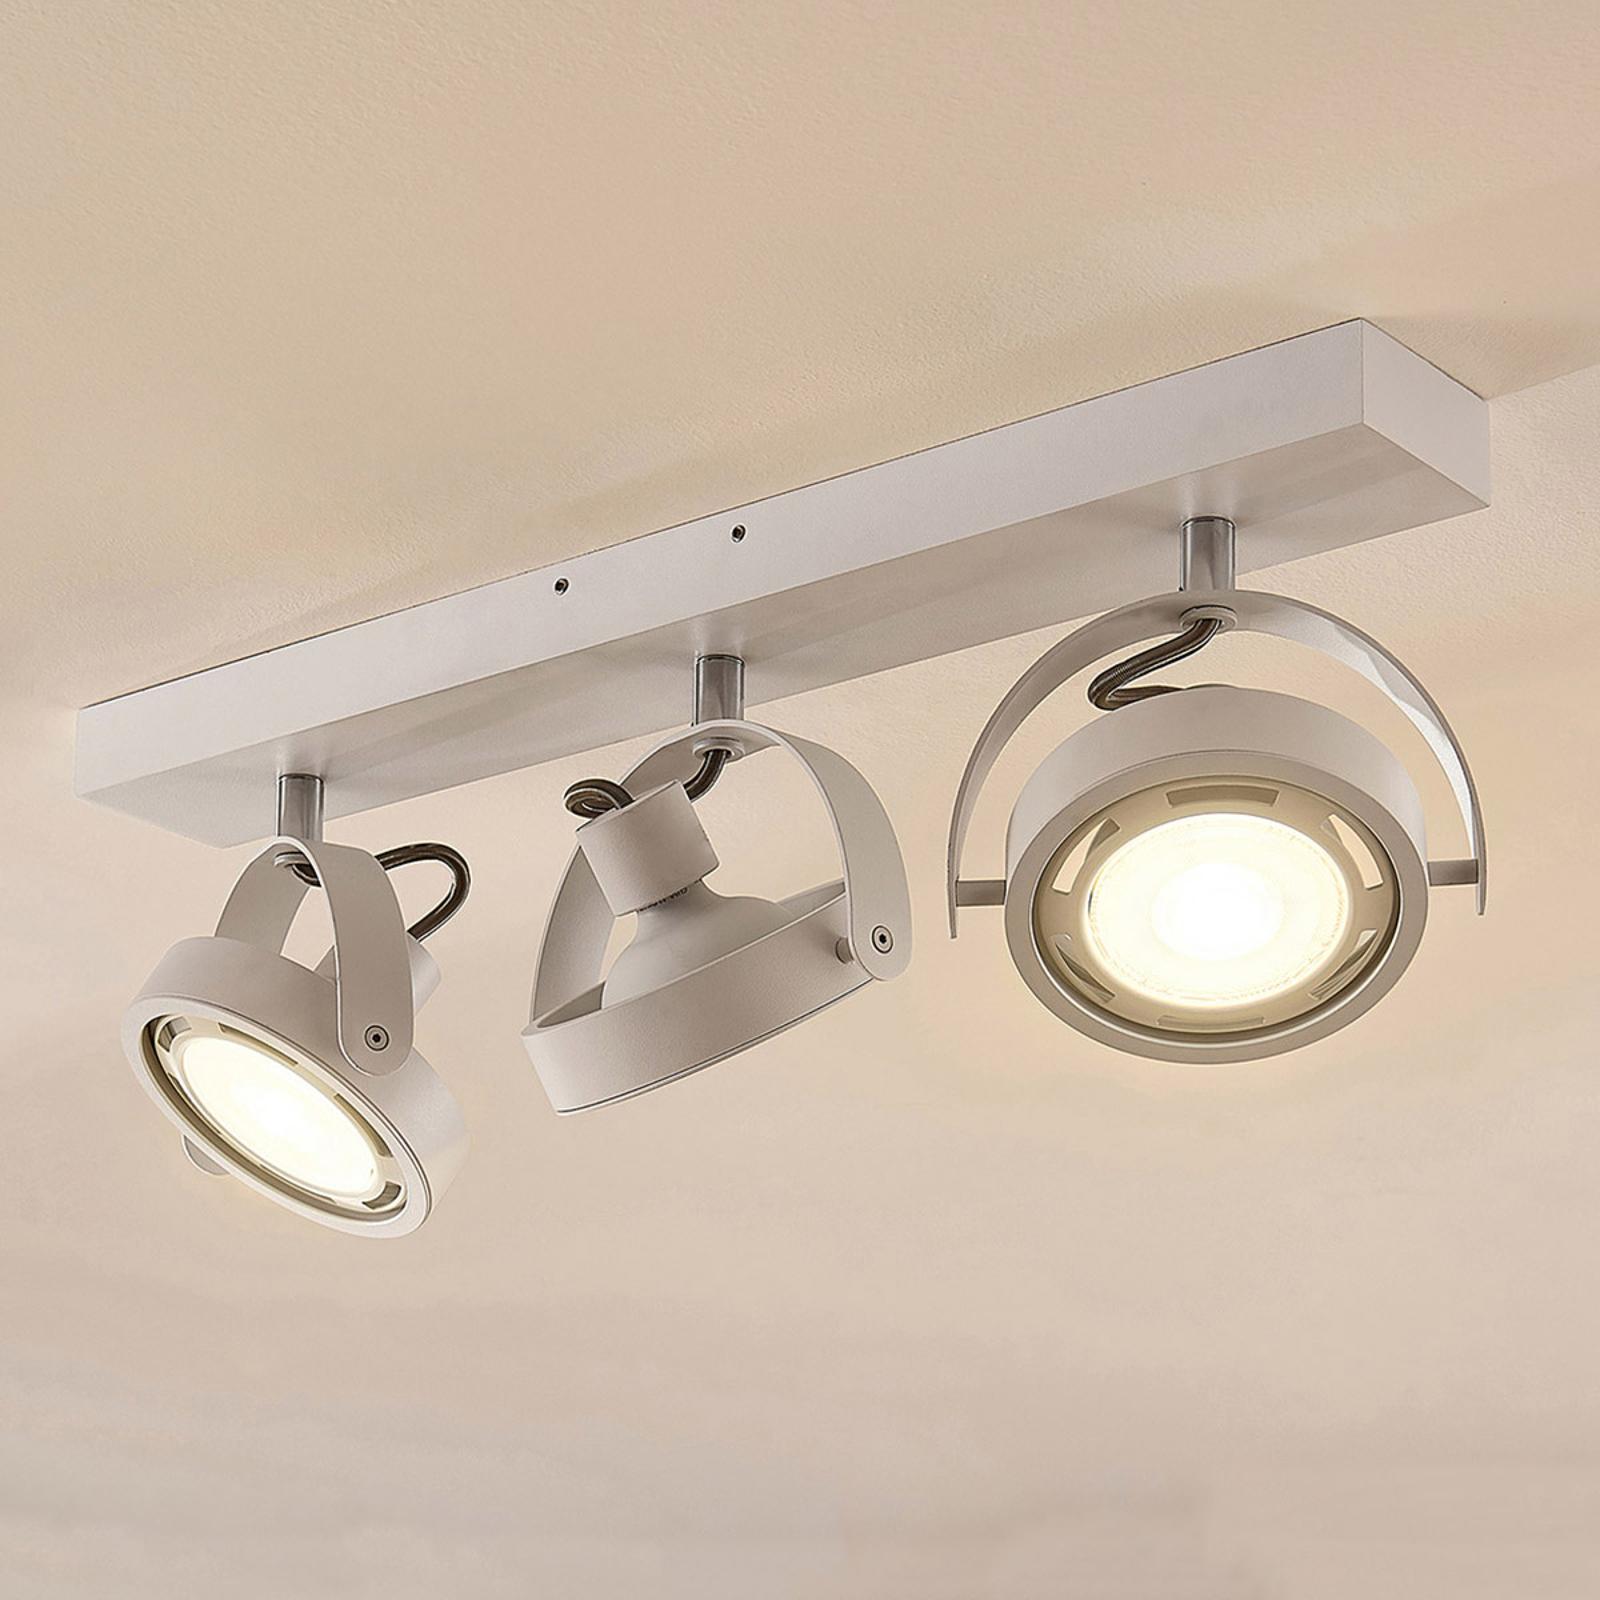 LED-Strahler Munin, dimmbar, weiß, 3-flammig